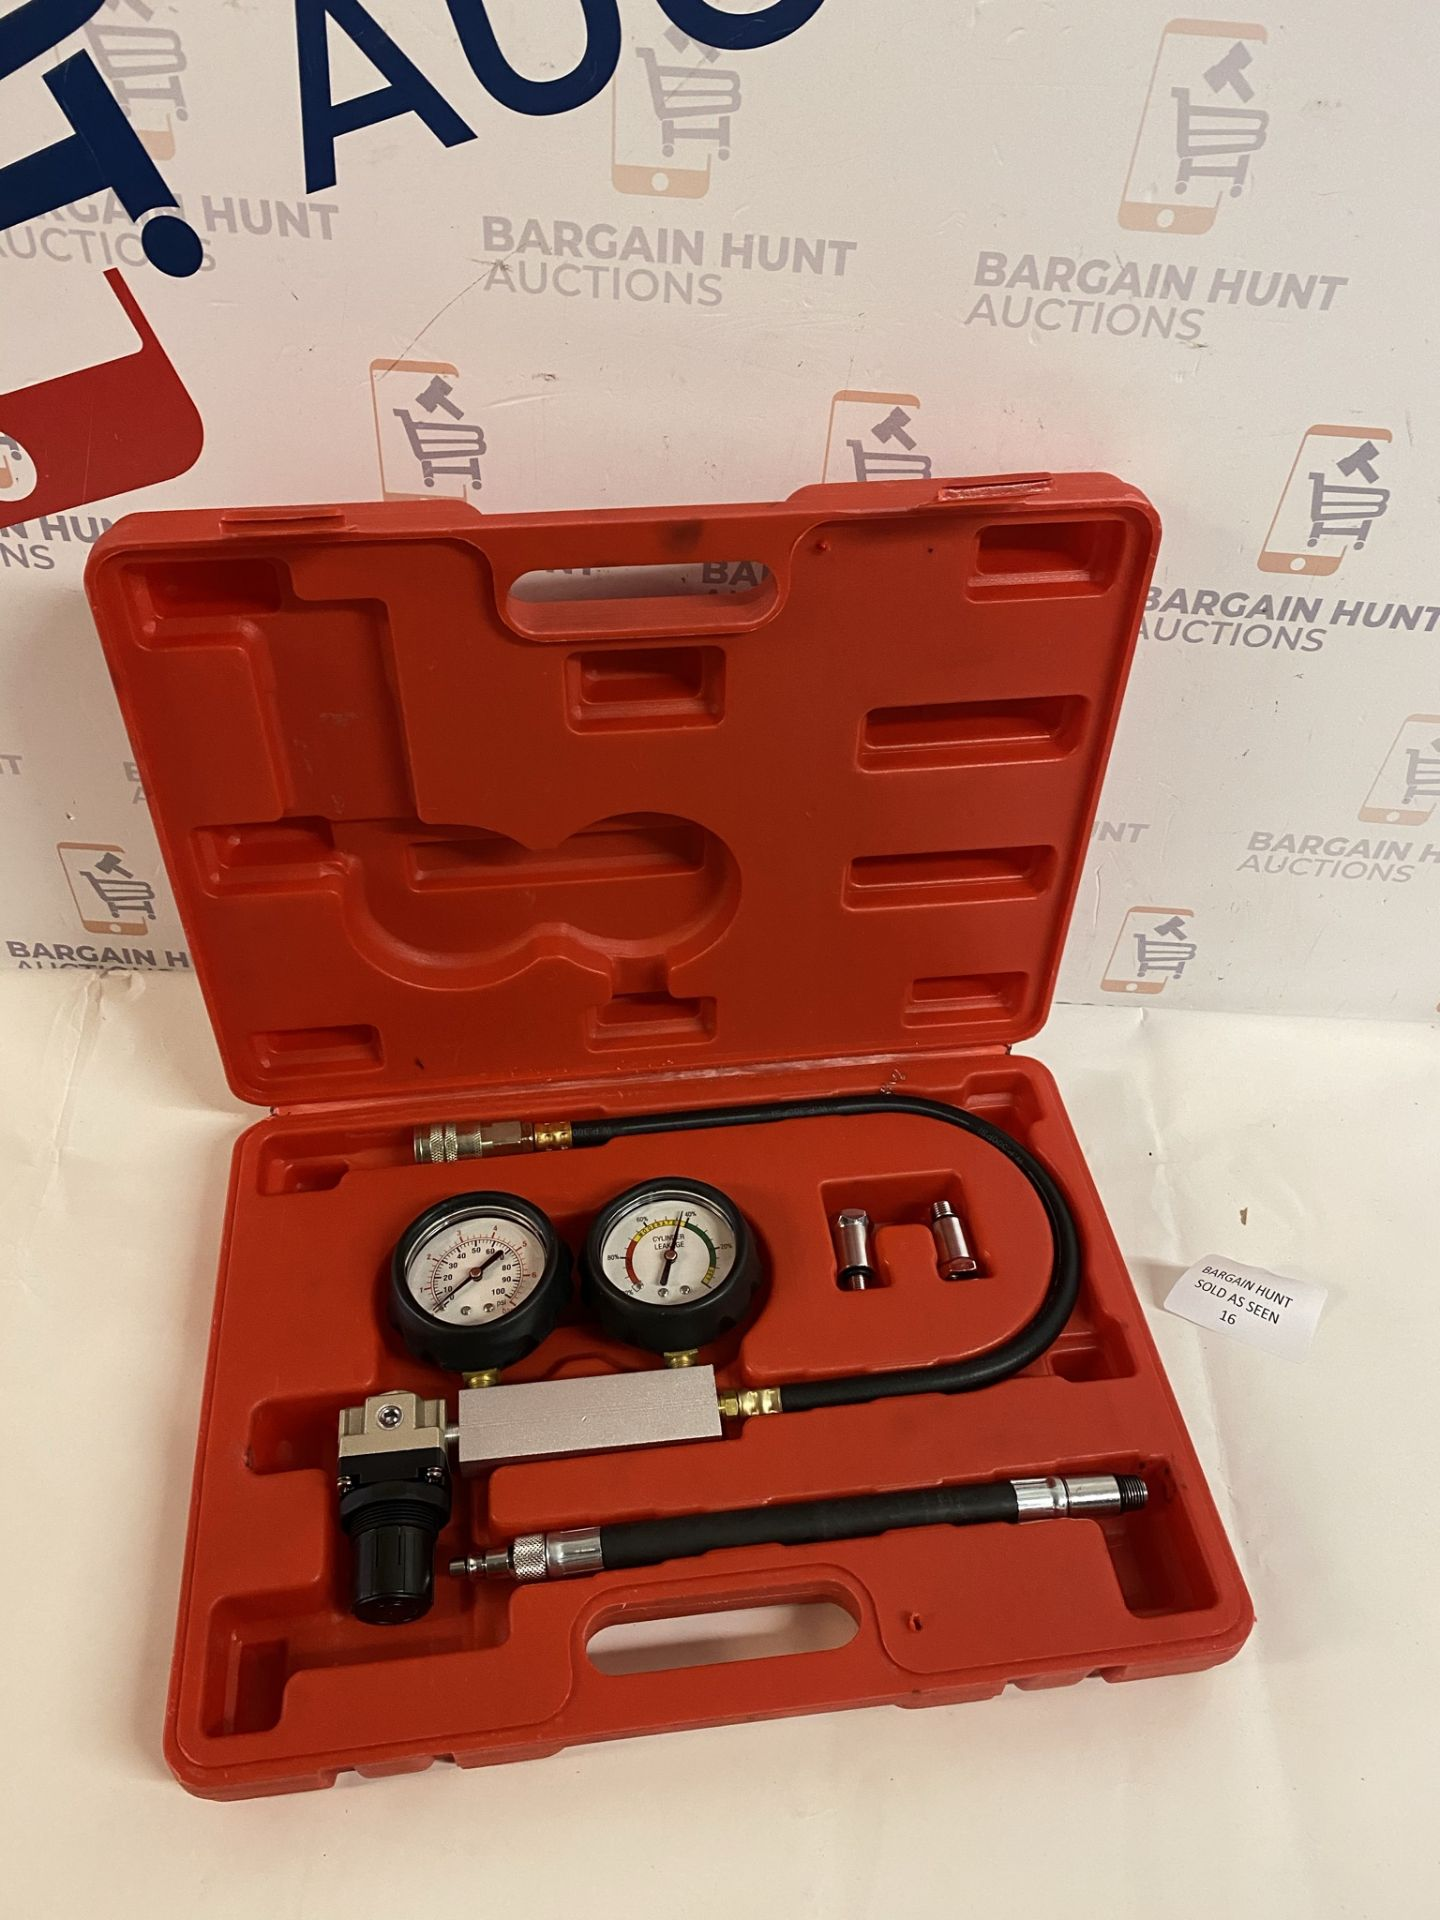 Sealey Petrol Engine Cylinder Leakage Tester RRP £65